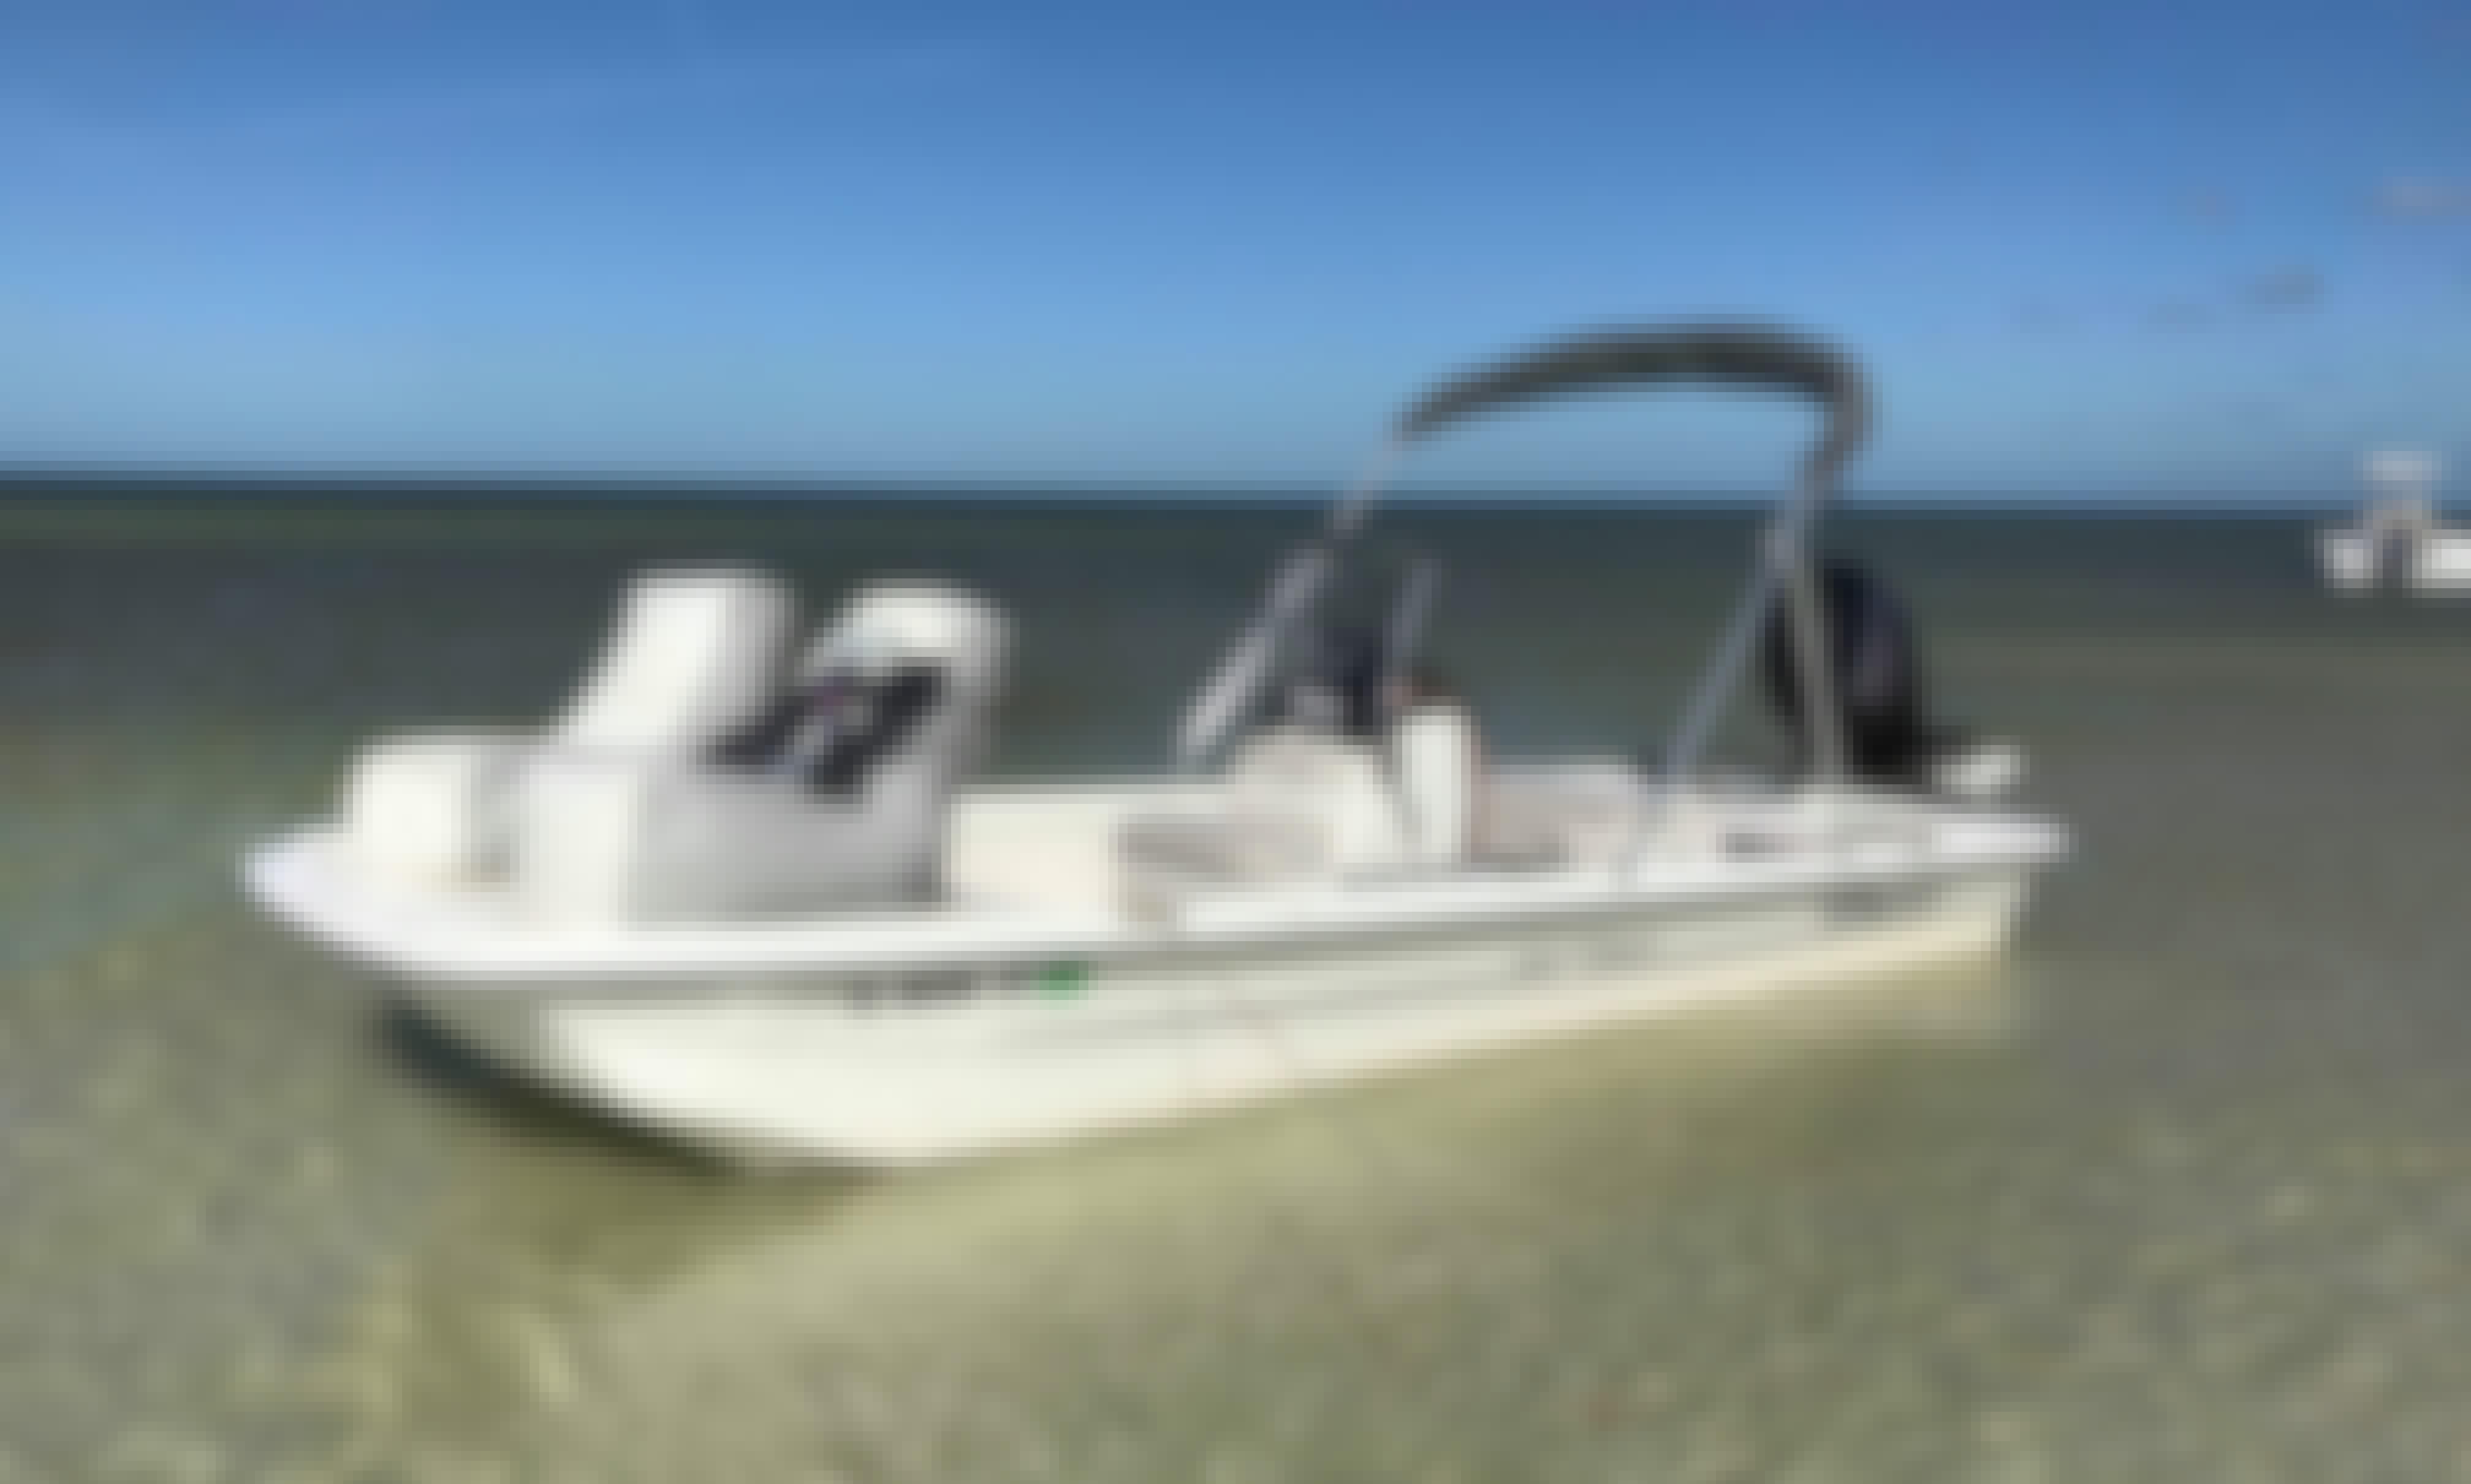 Inshore Cruise, Shelling, Fishing in Clearwater, Florida Aboard a Mako pro 17